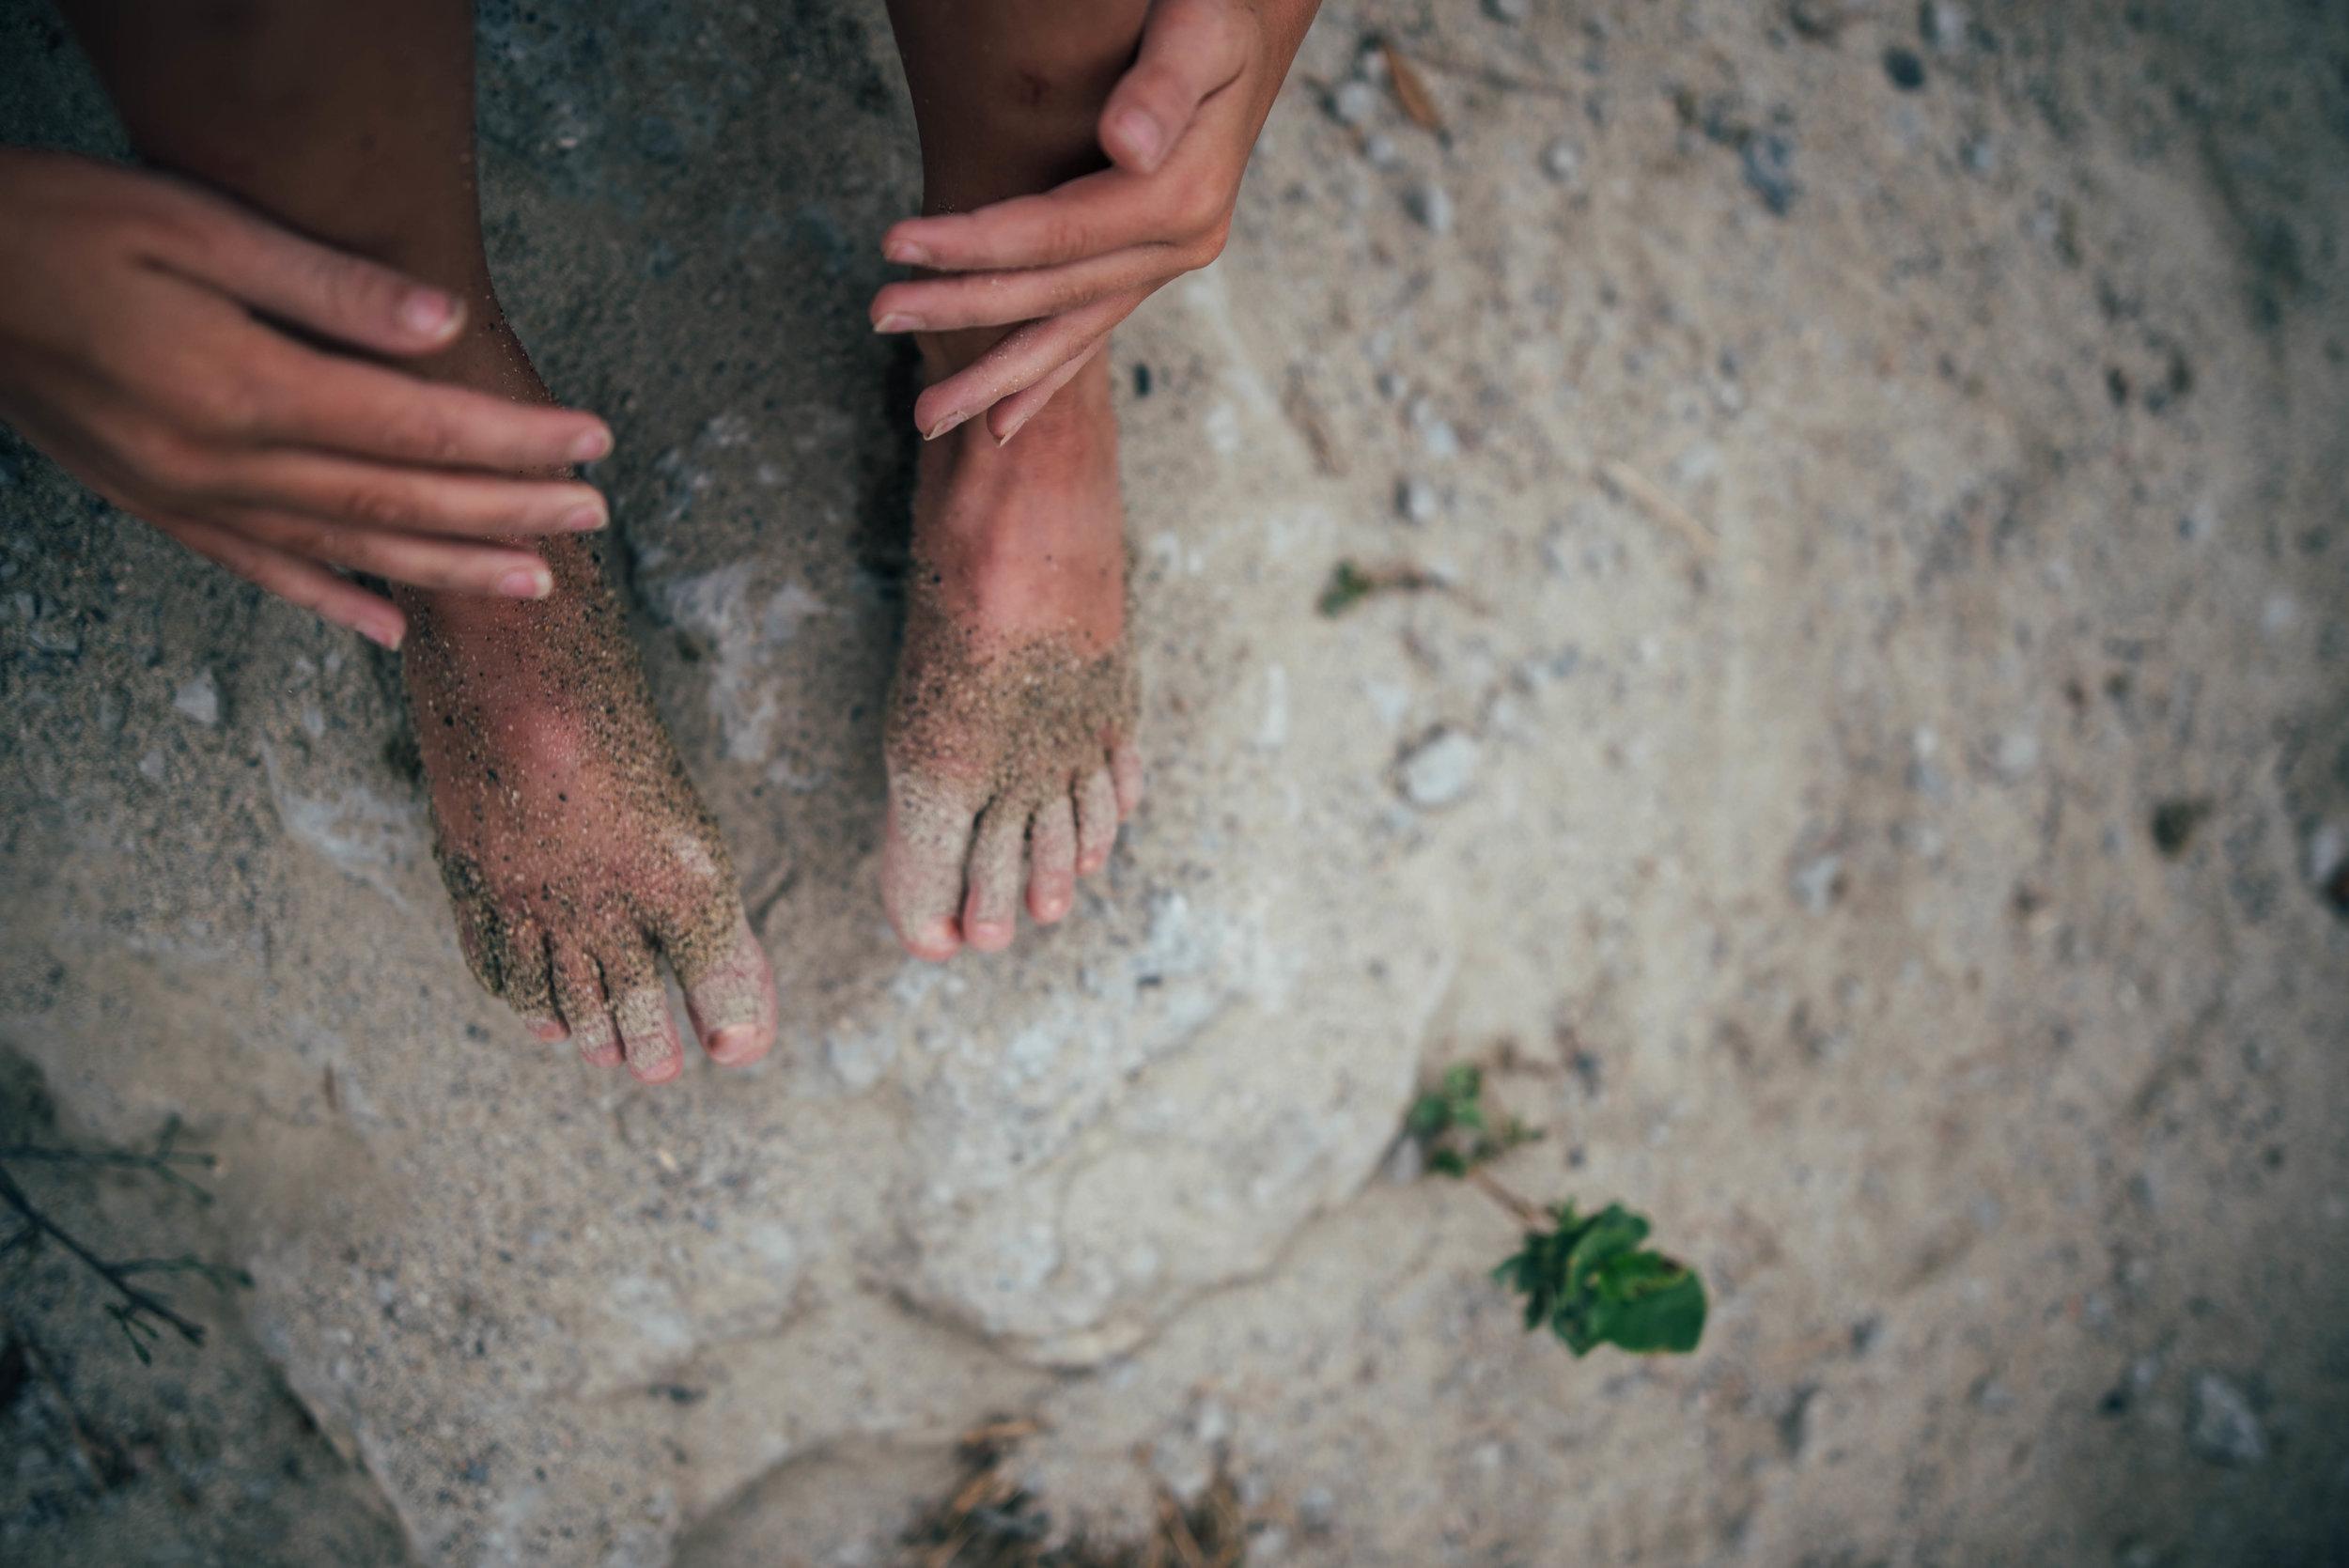 Girls sandy feet and hands Essex UK Documentary Portrait Photographer